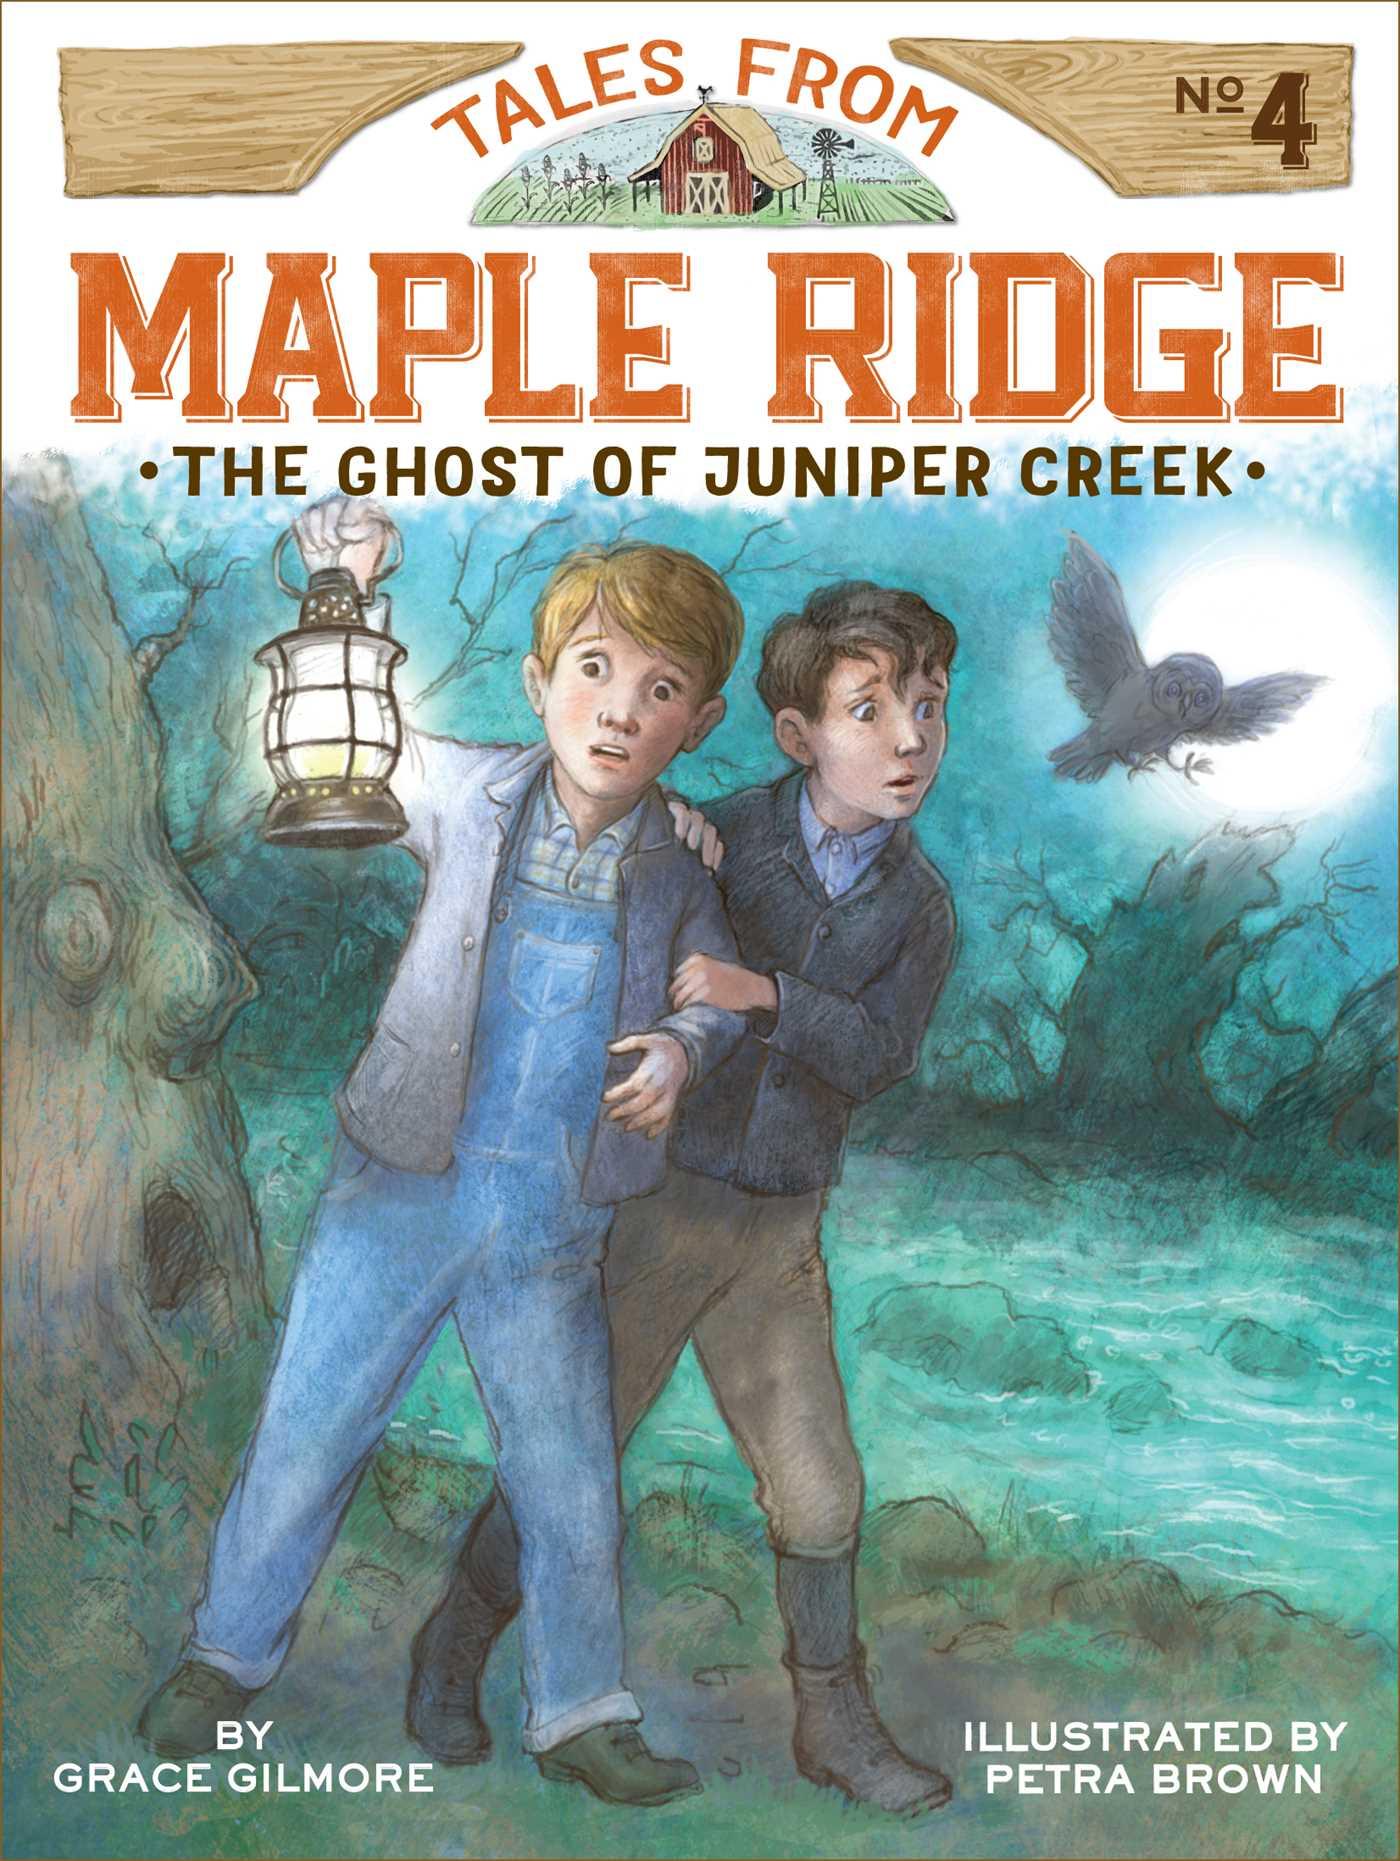 The ghost of juniper creek 9781481430111 hr